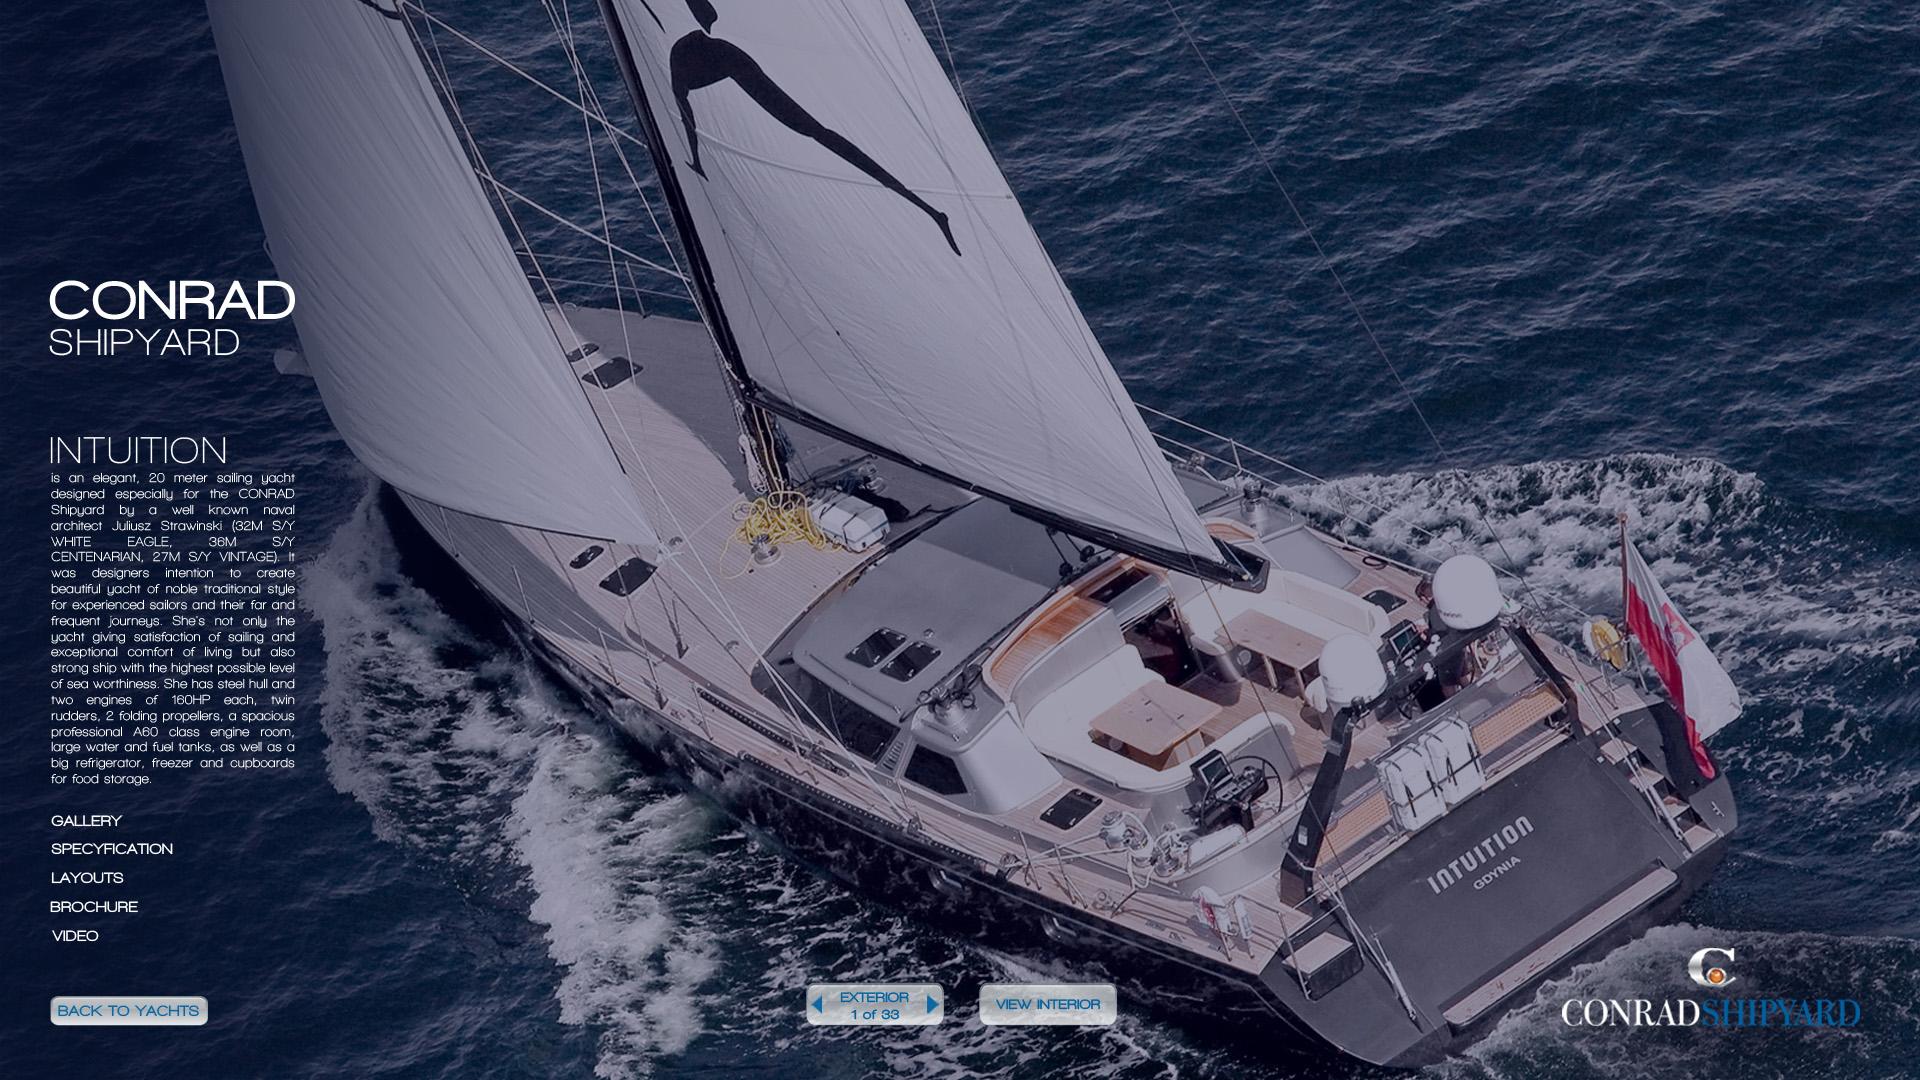 1_1 sailing jachts strona jachtu